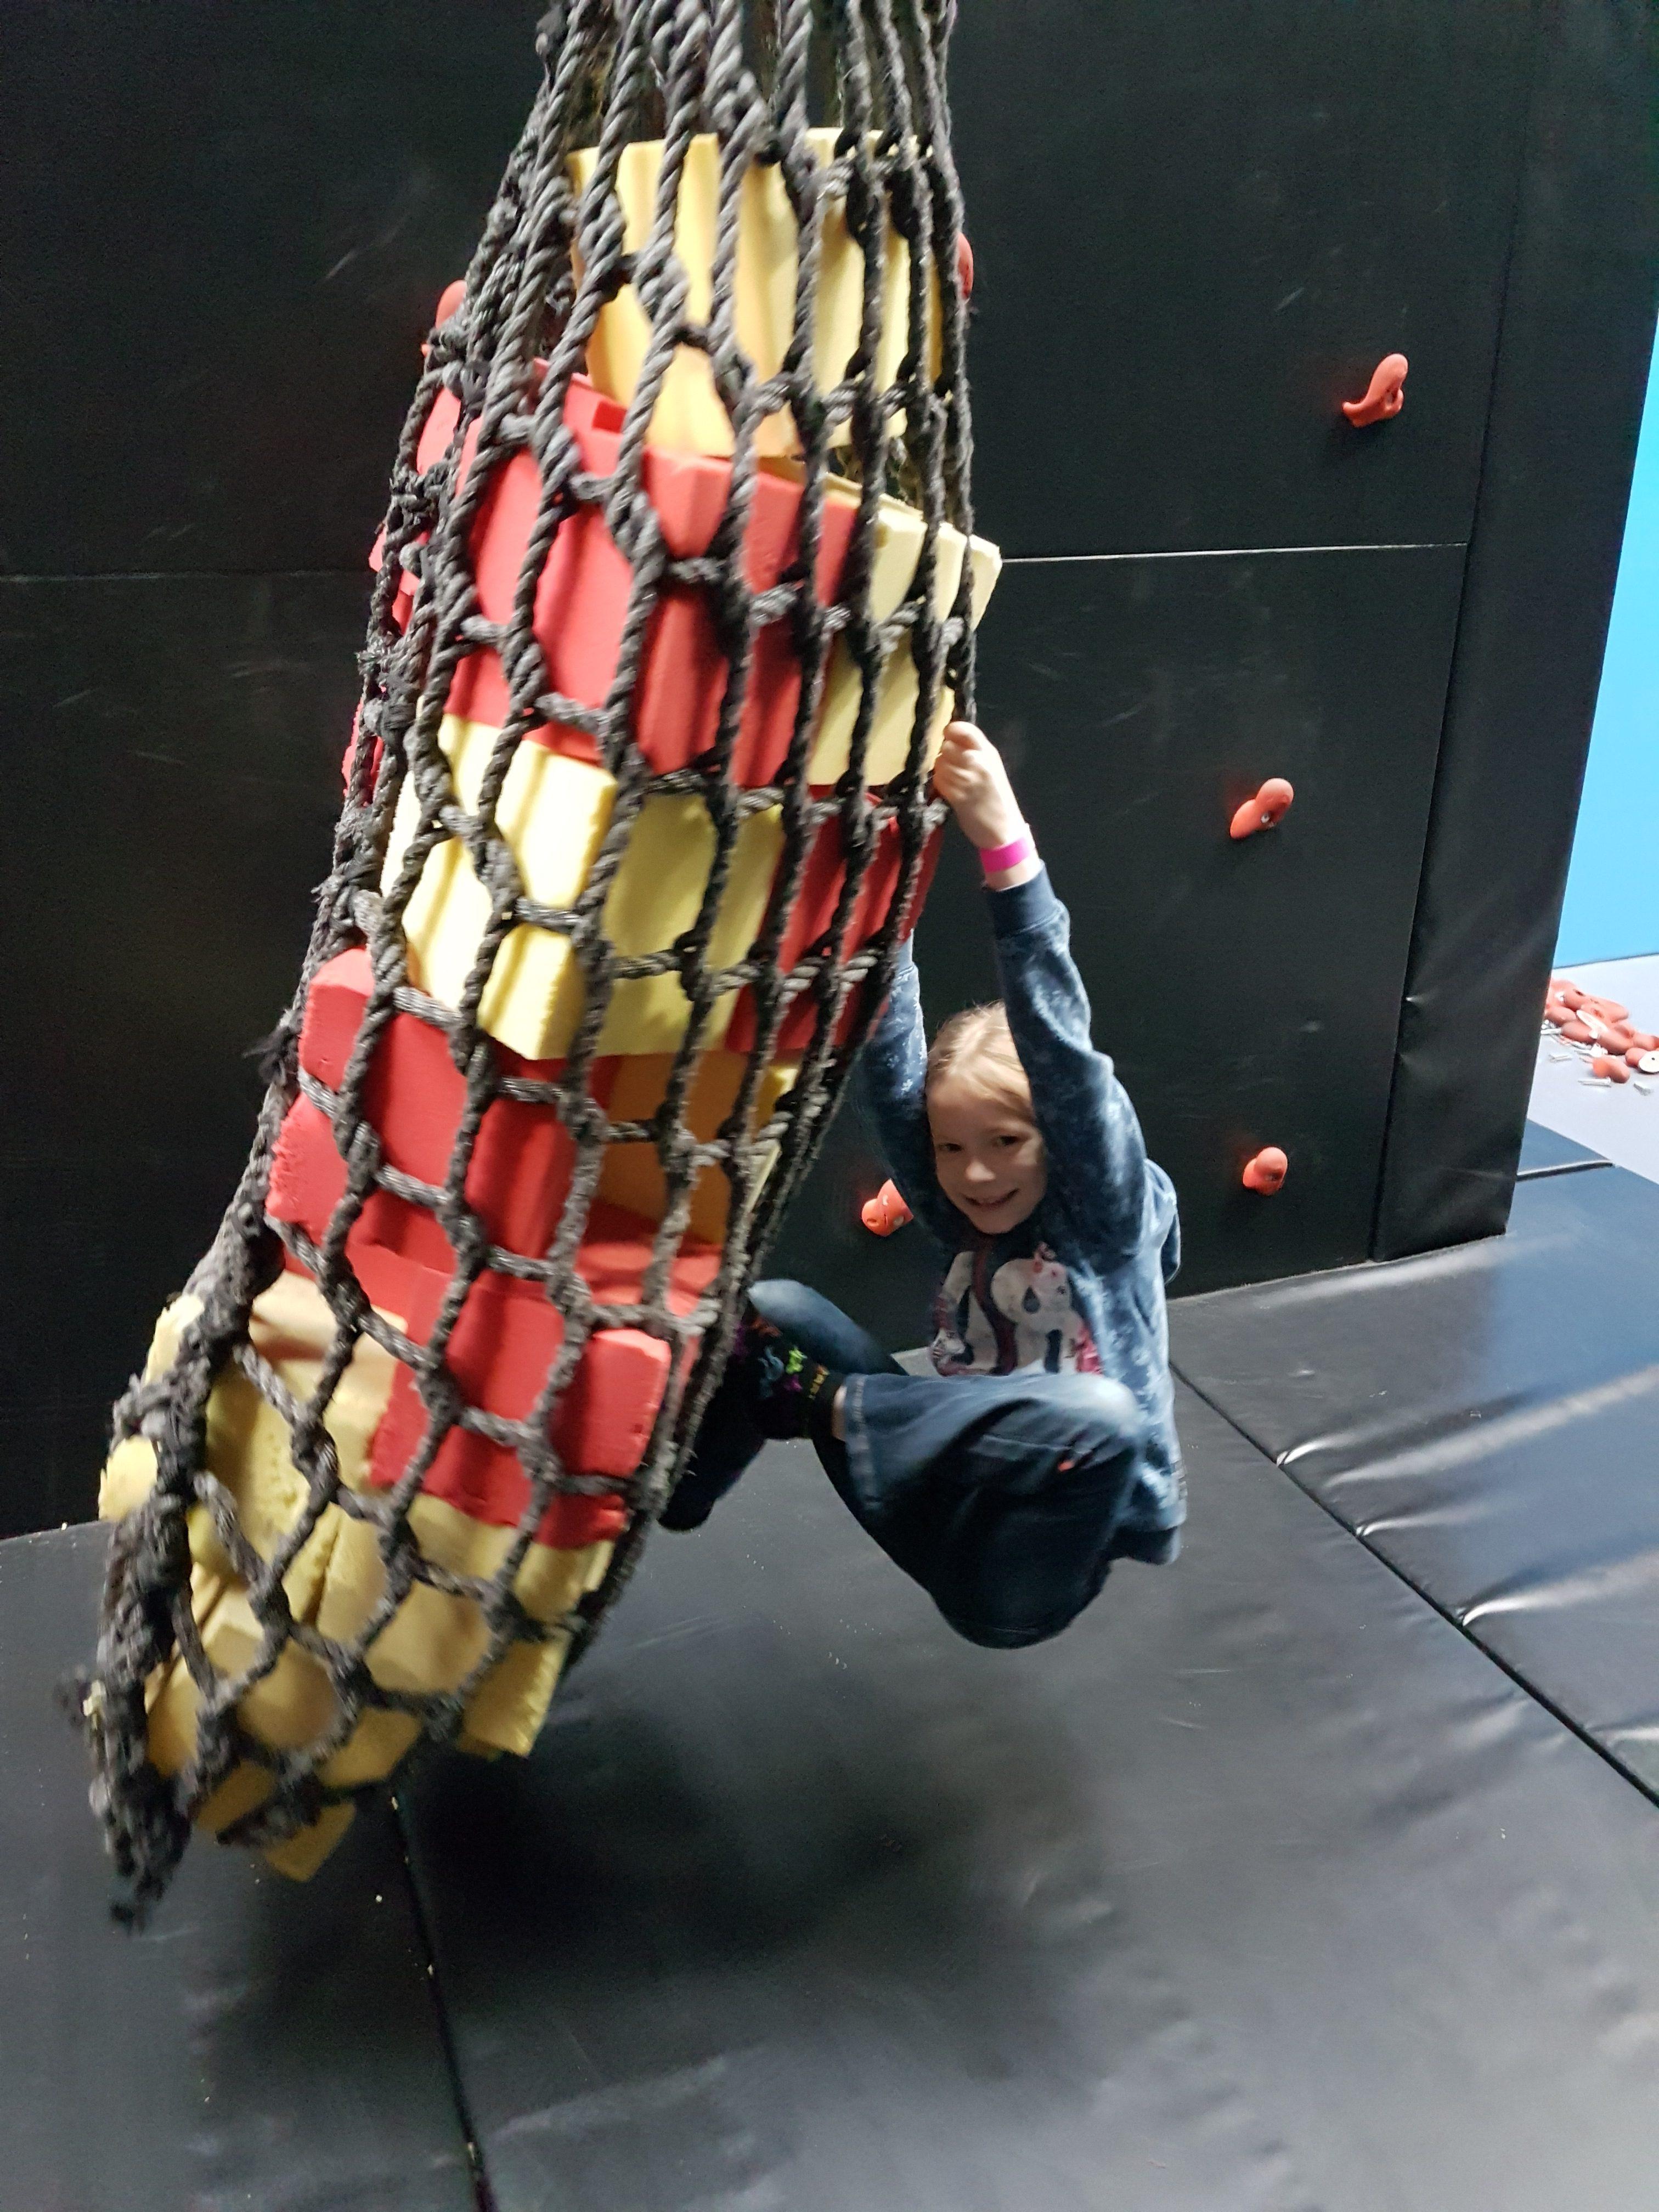 Ninja warrior course at Red Kangaroo trampoline park Reading